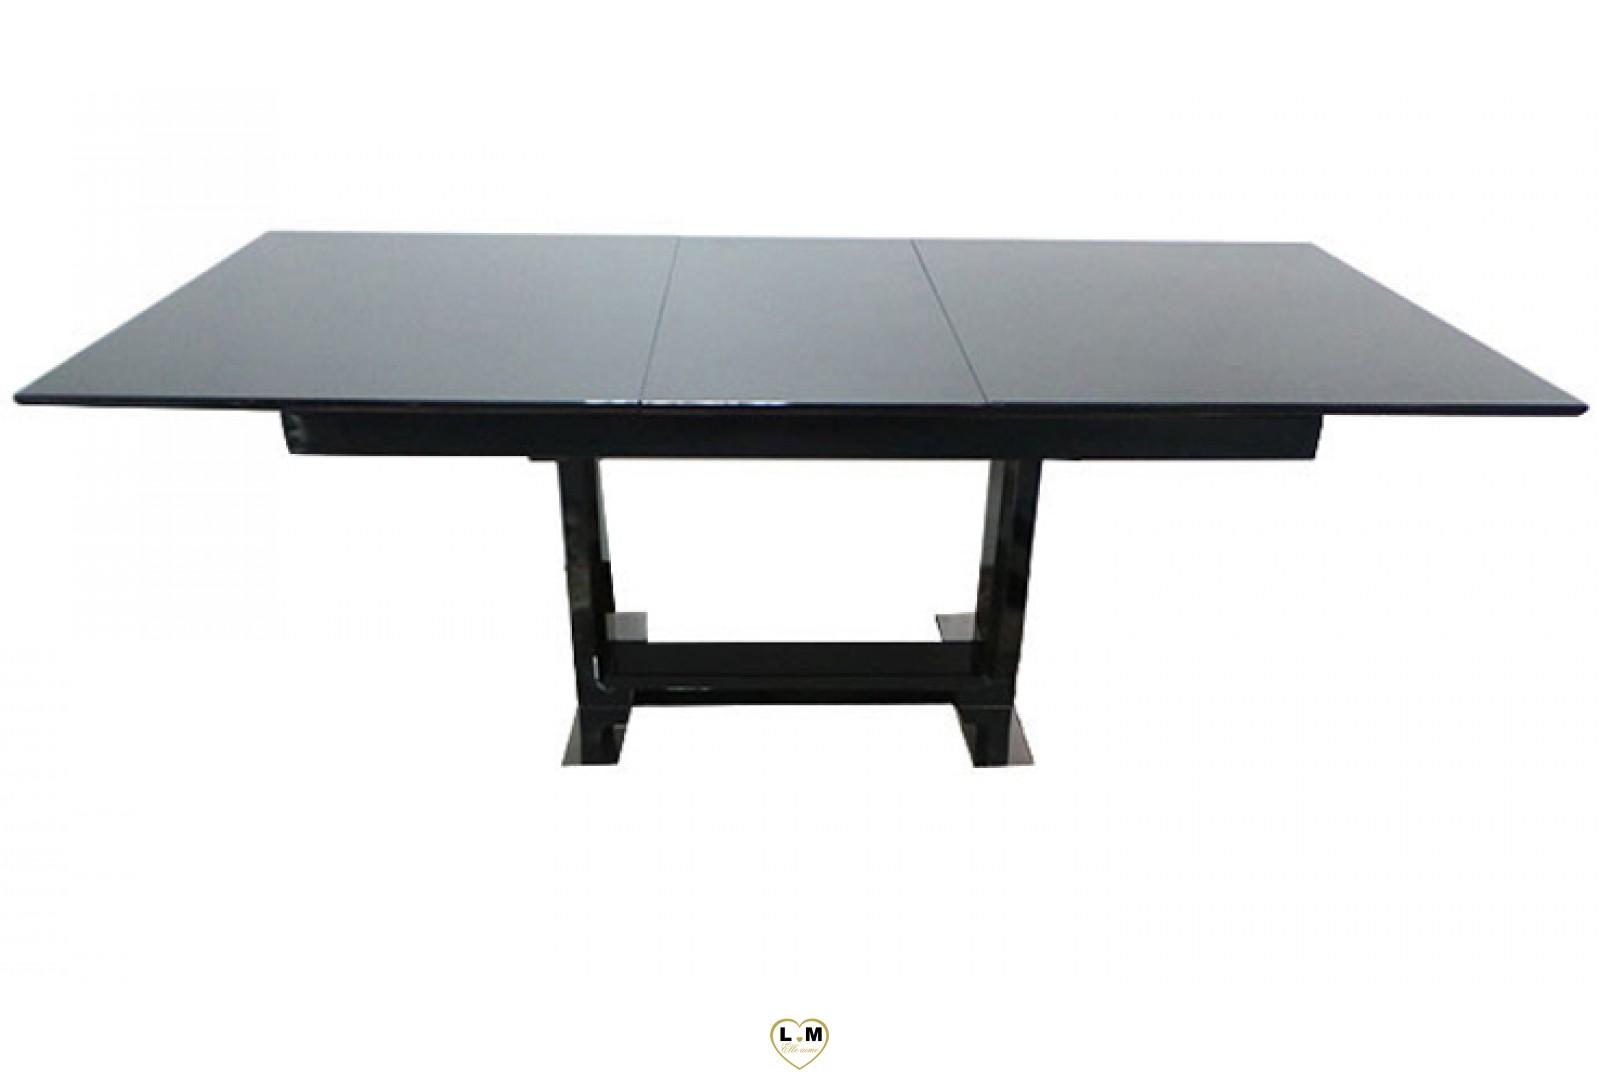 Table salle a manger noir maison design for Salle a manger table noire